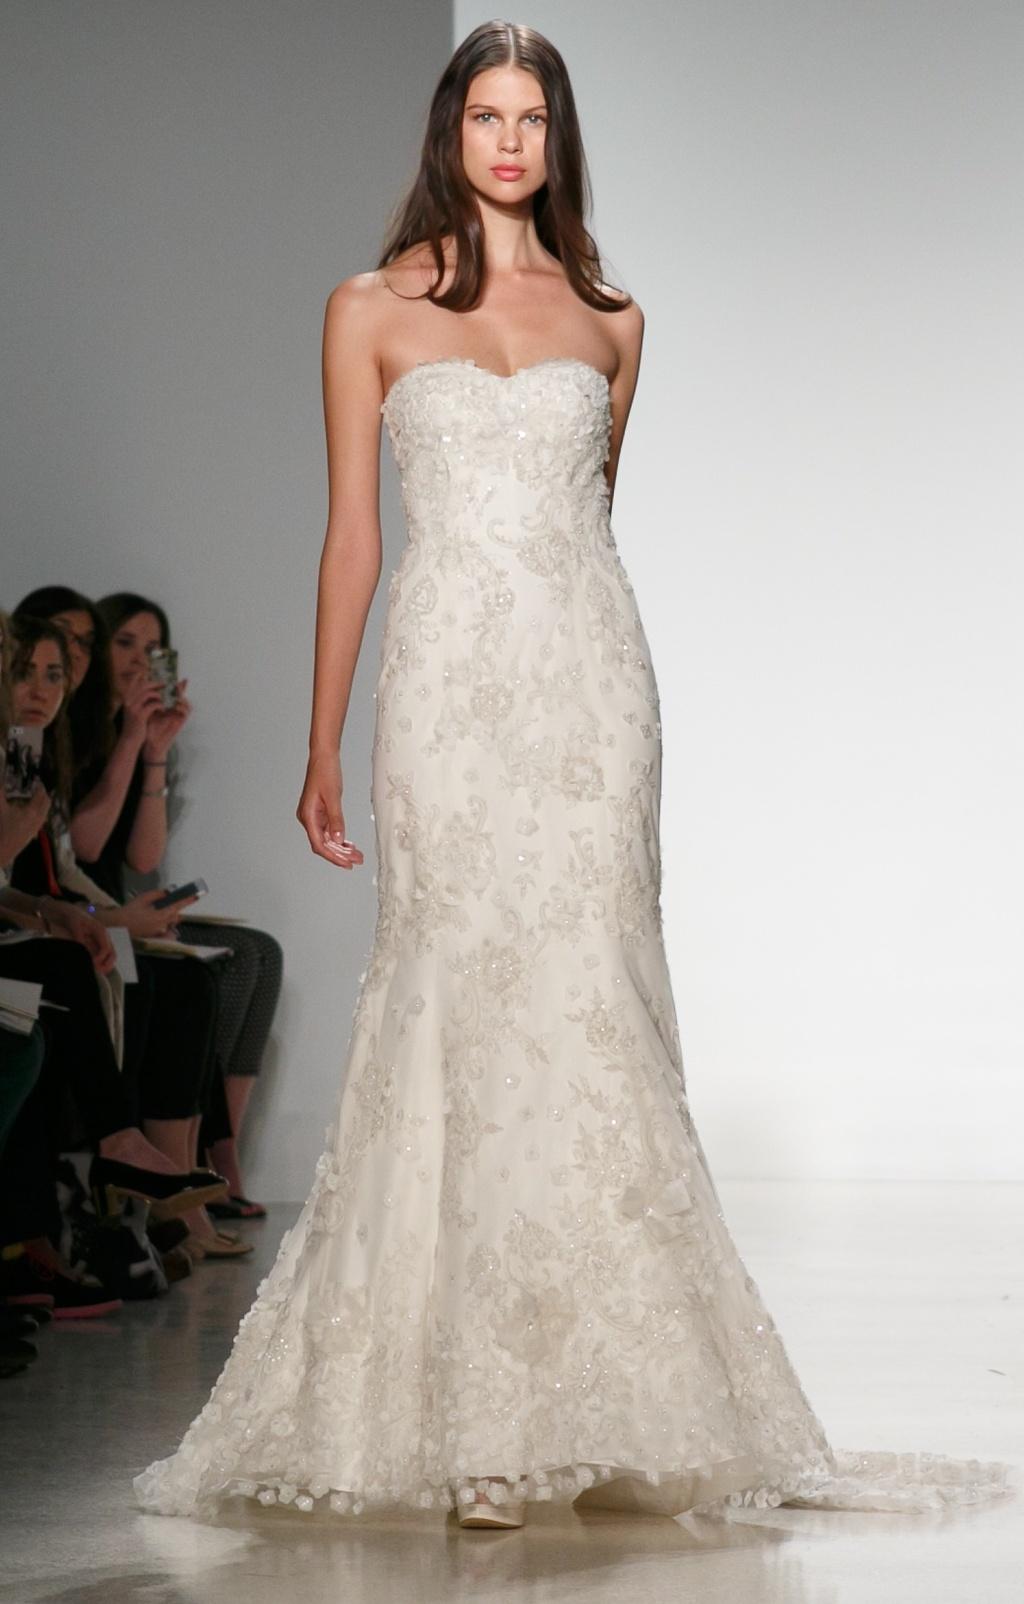 Christos-wedding-dress-spring-2014-bridal-7.full